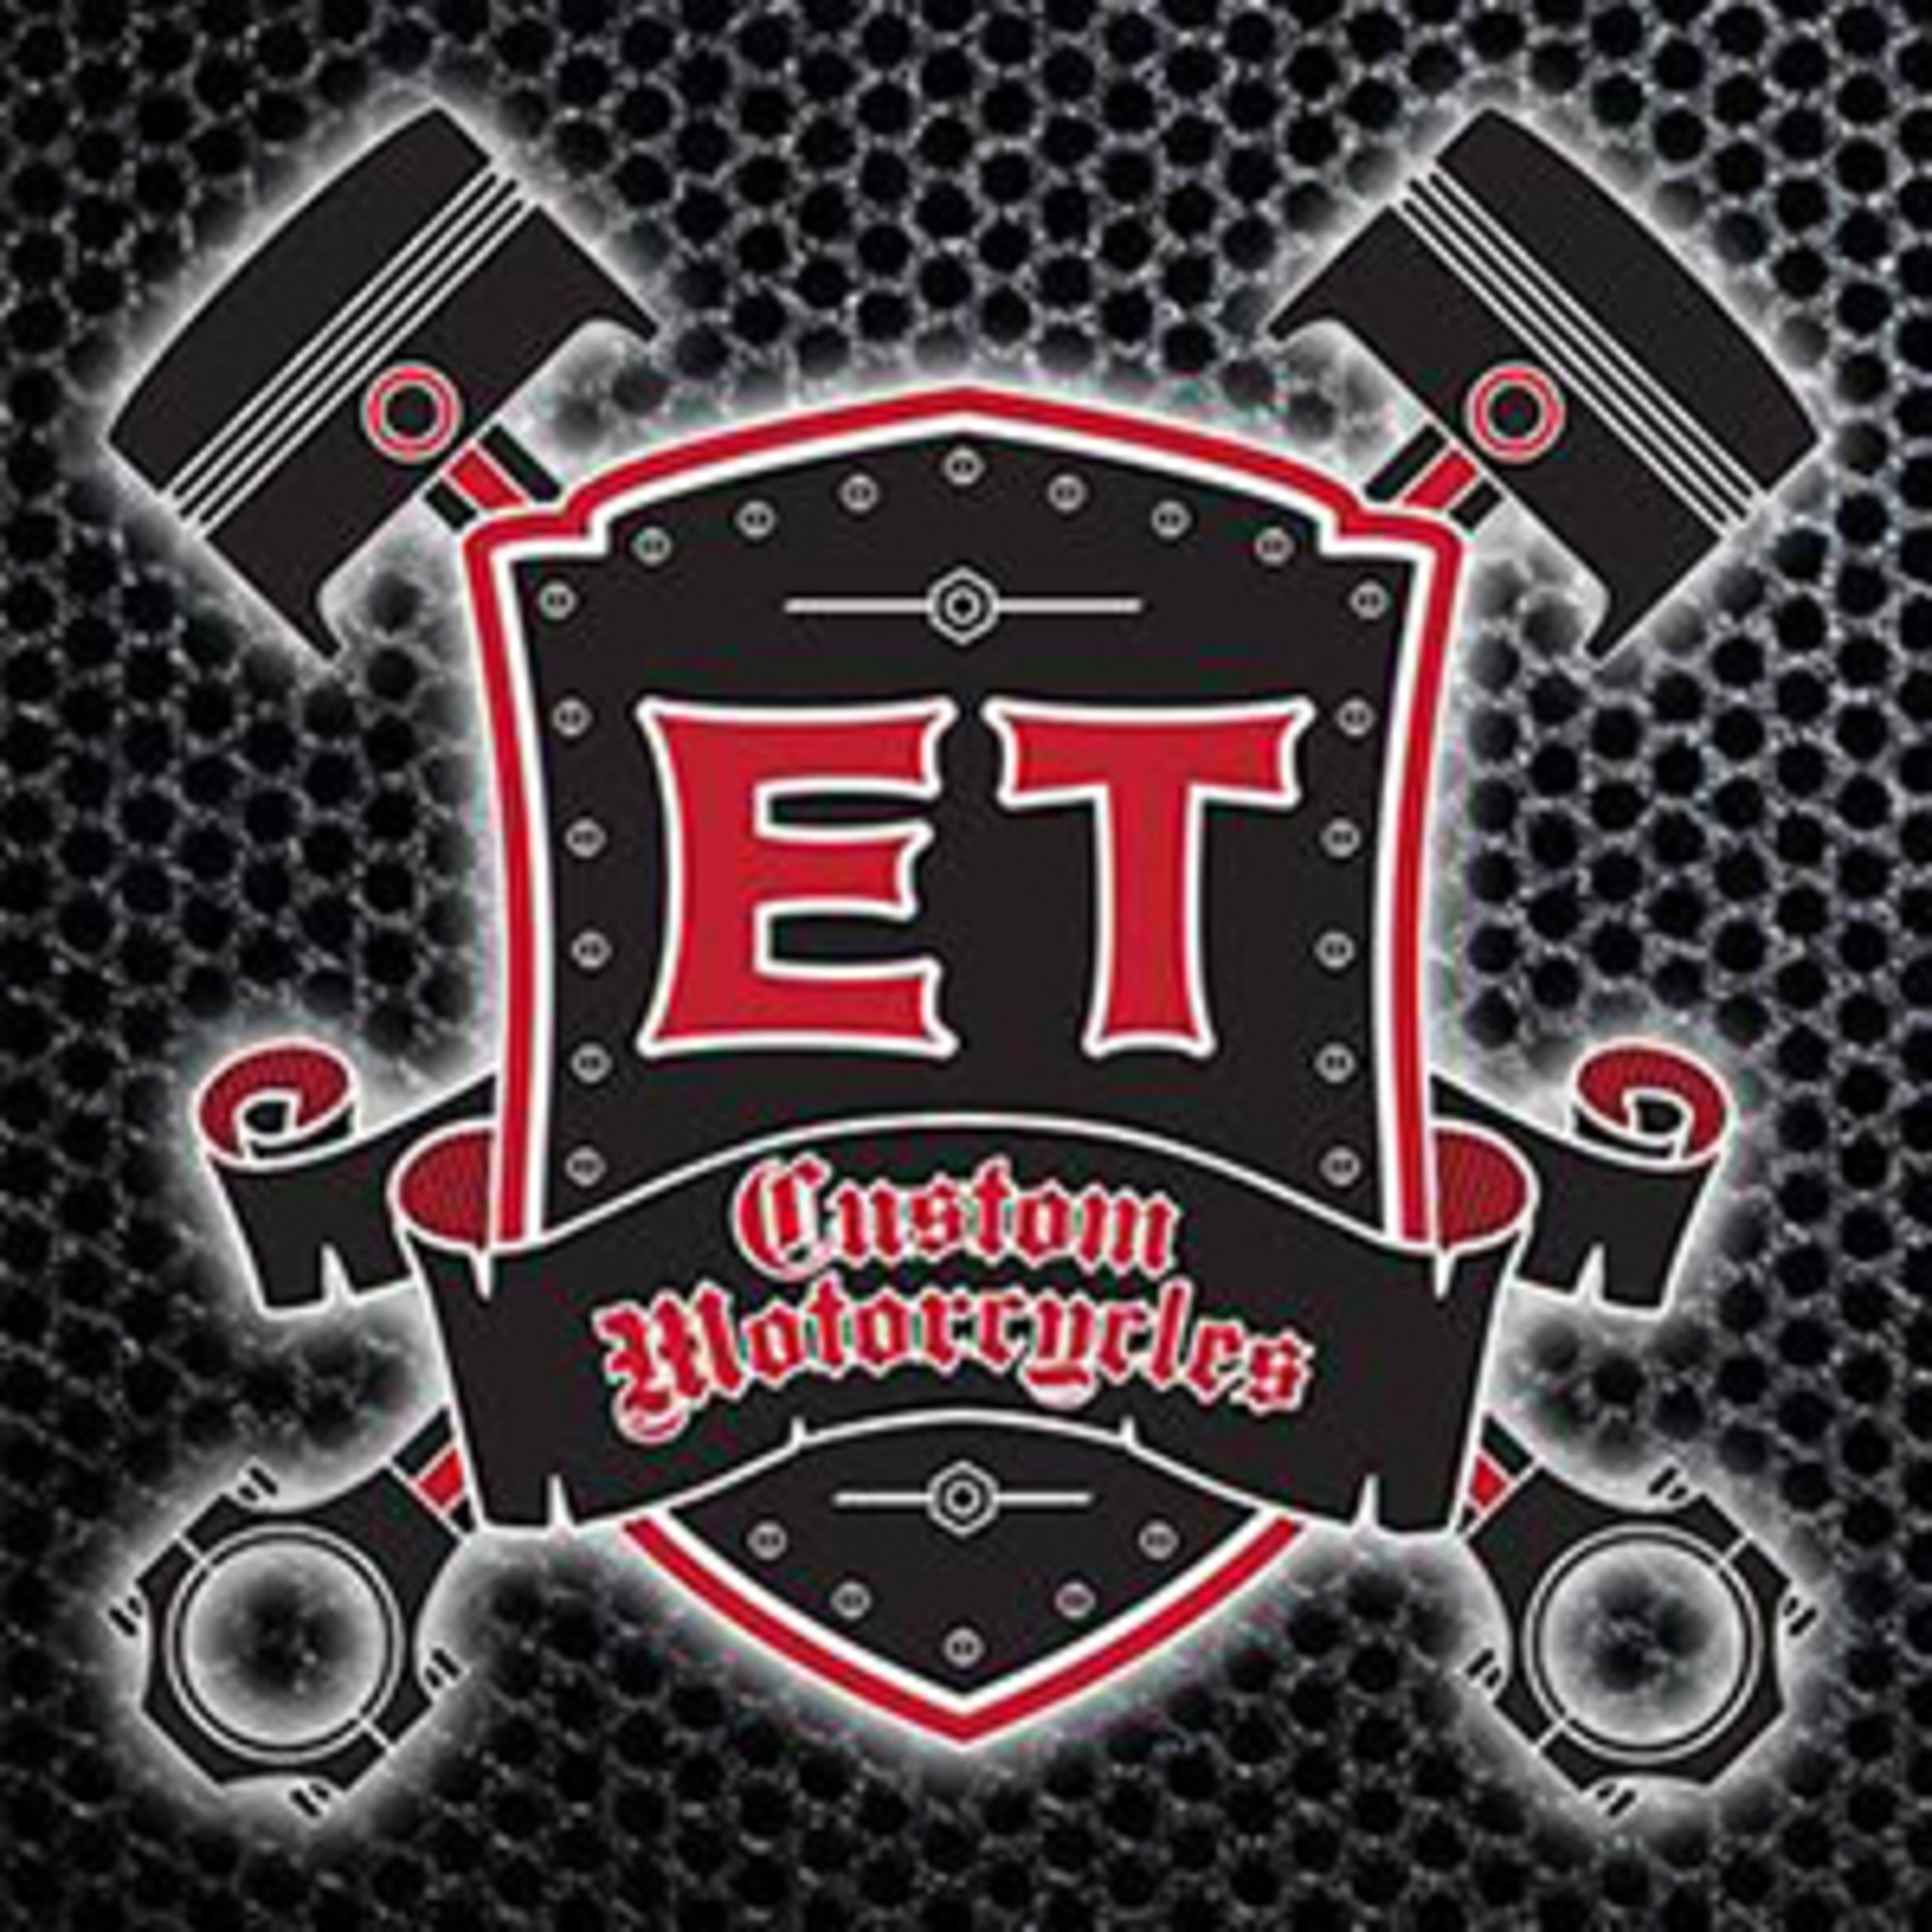 et custom motorcyles- company logo